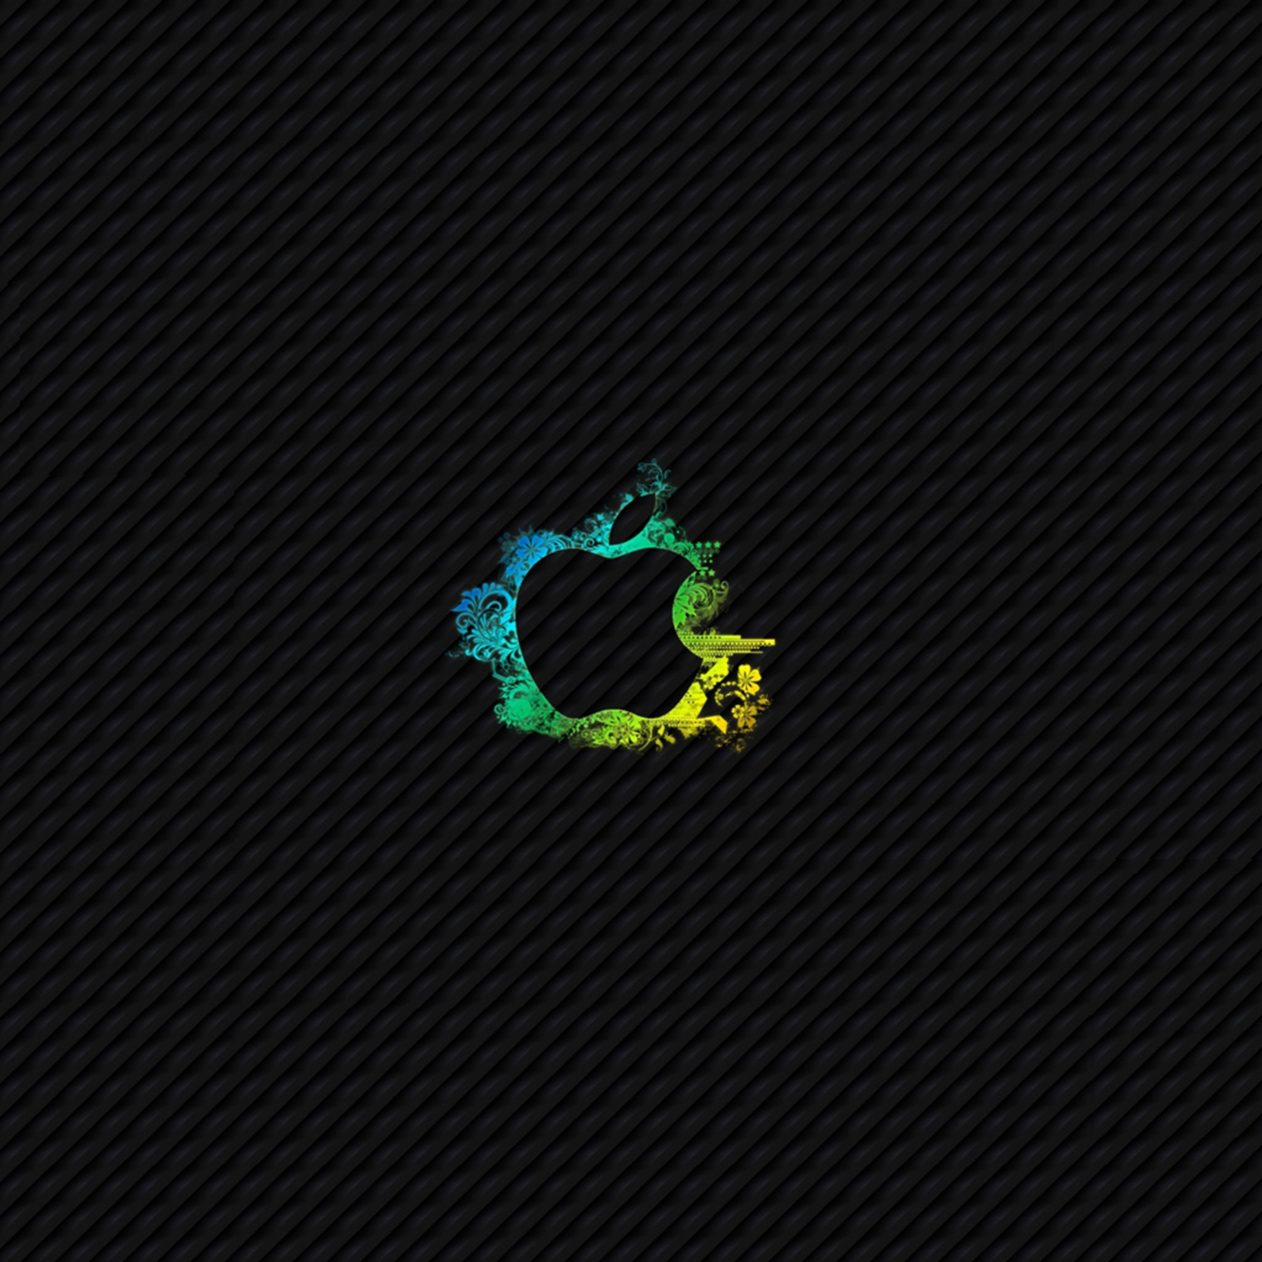 1262x1262 Parallax wallpaper 4k Apple Wallpaper Ipad Wallpaper 1262x1262 pixels resolution